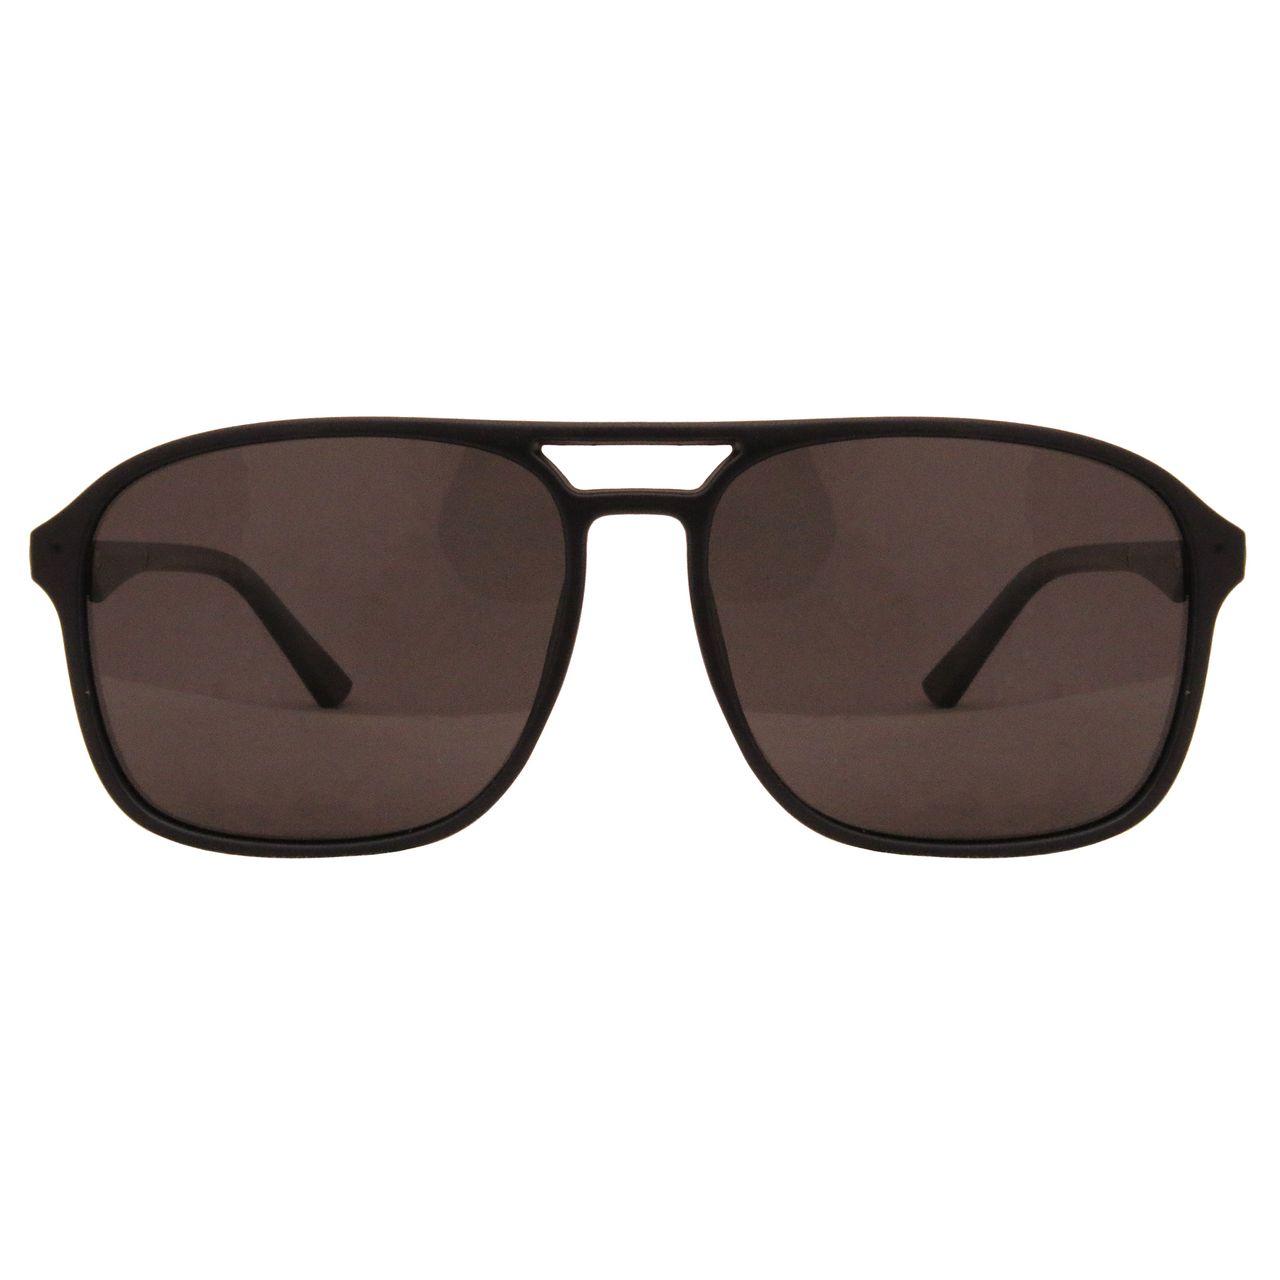 عینک آفتابی پورش دیزاین مدل Air9146C3BE